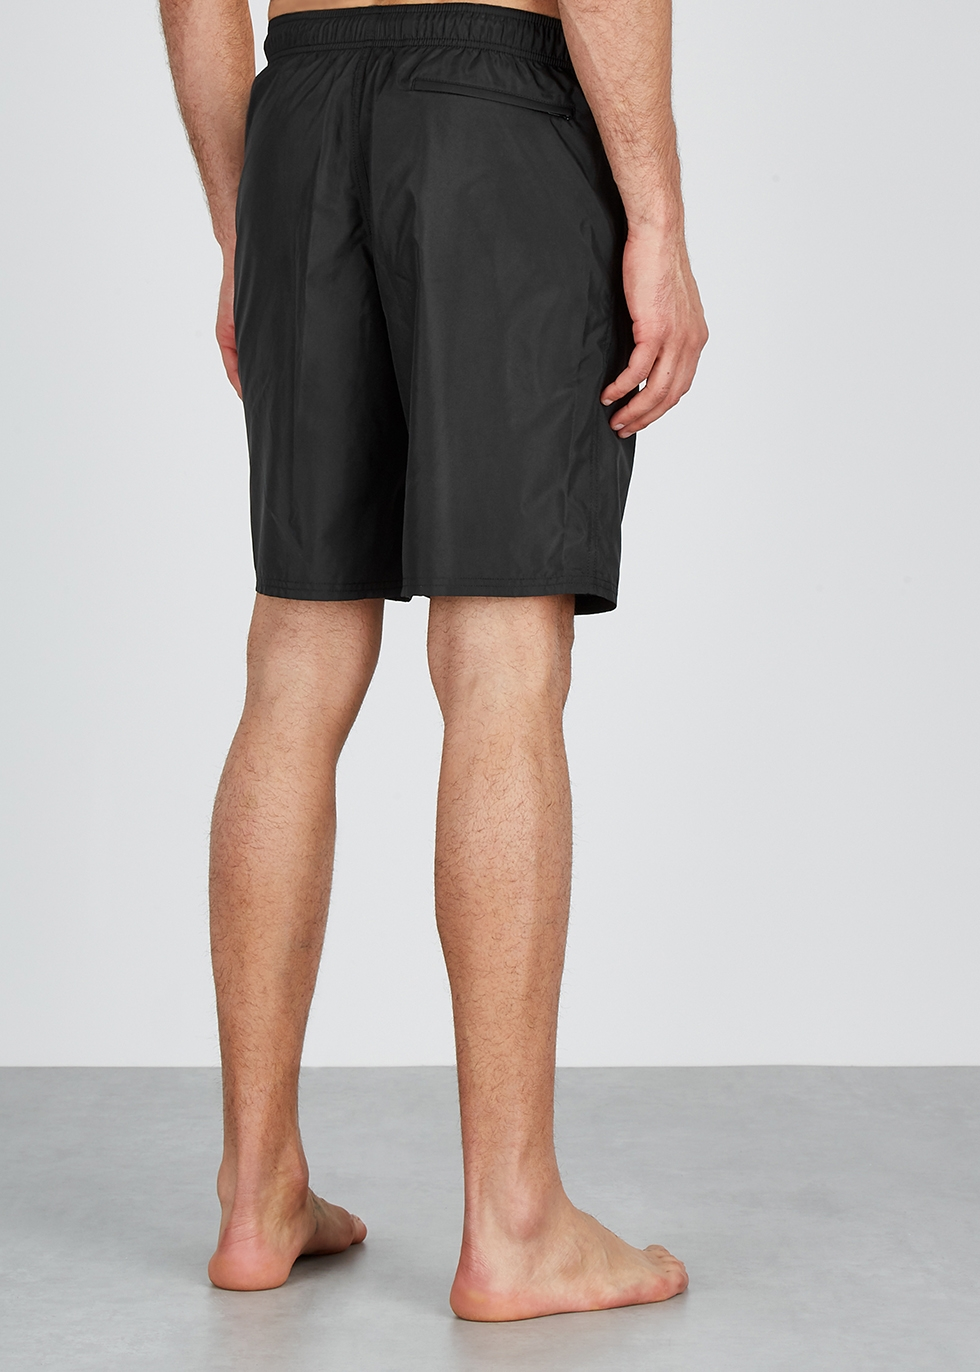 Black logo swim shorts - Givenchy